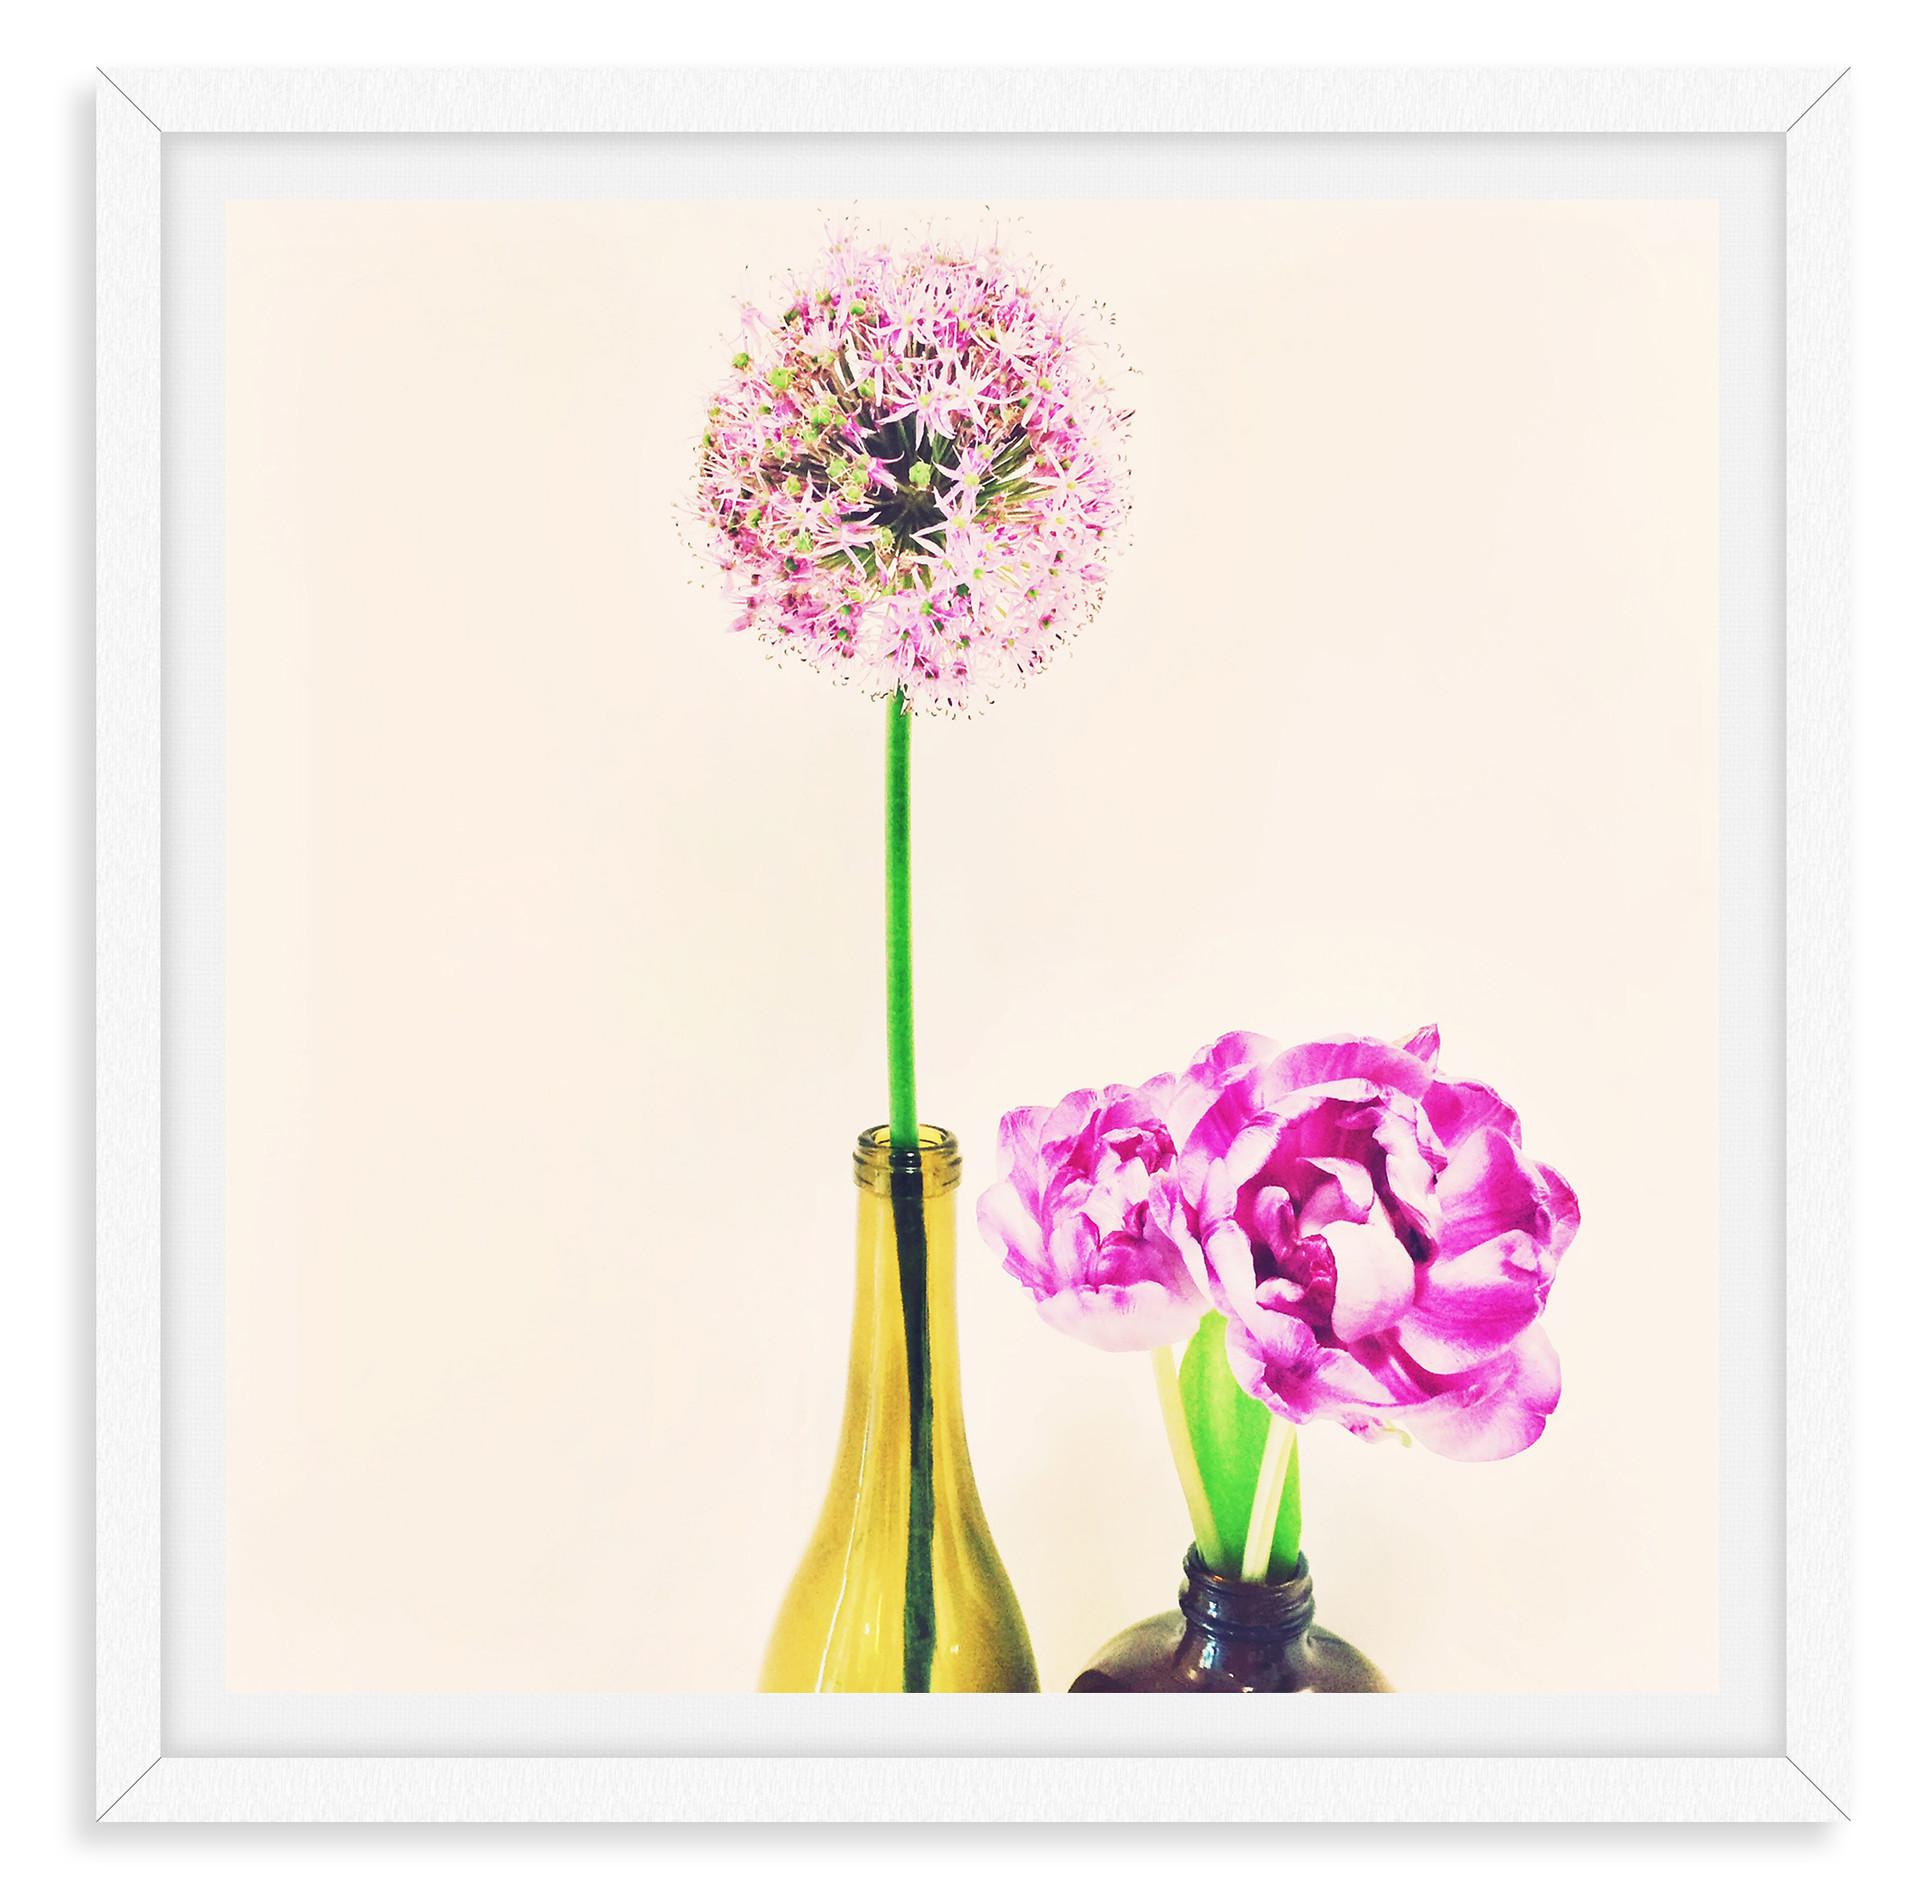 flowers illustration photography still l